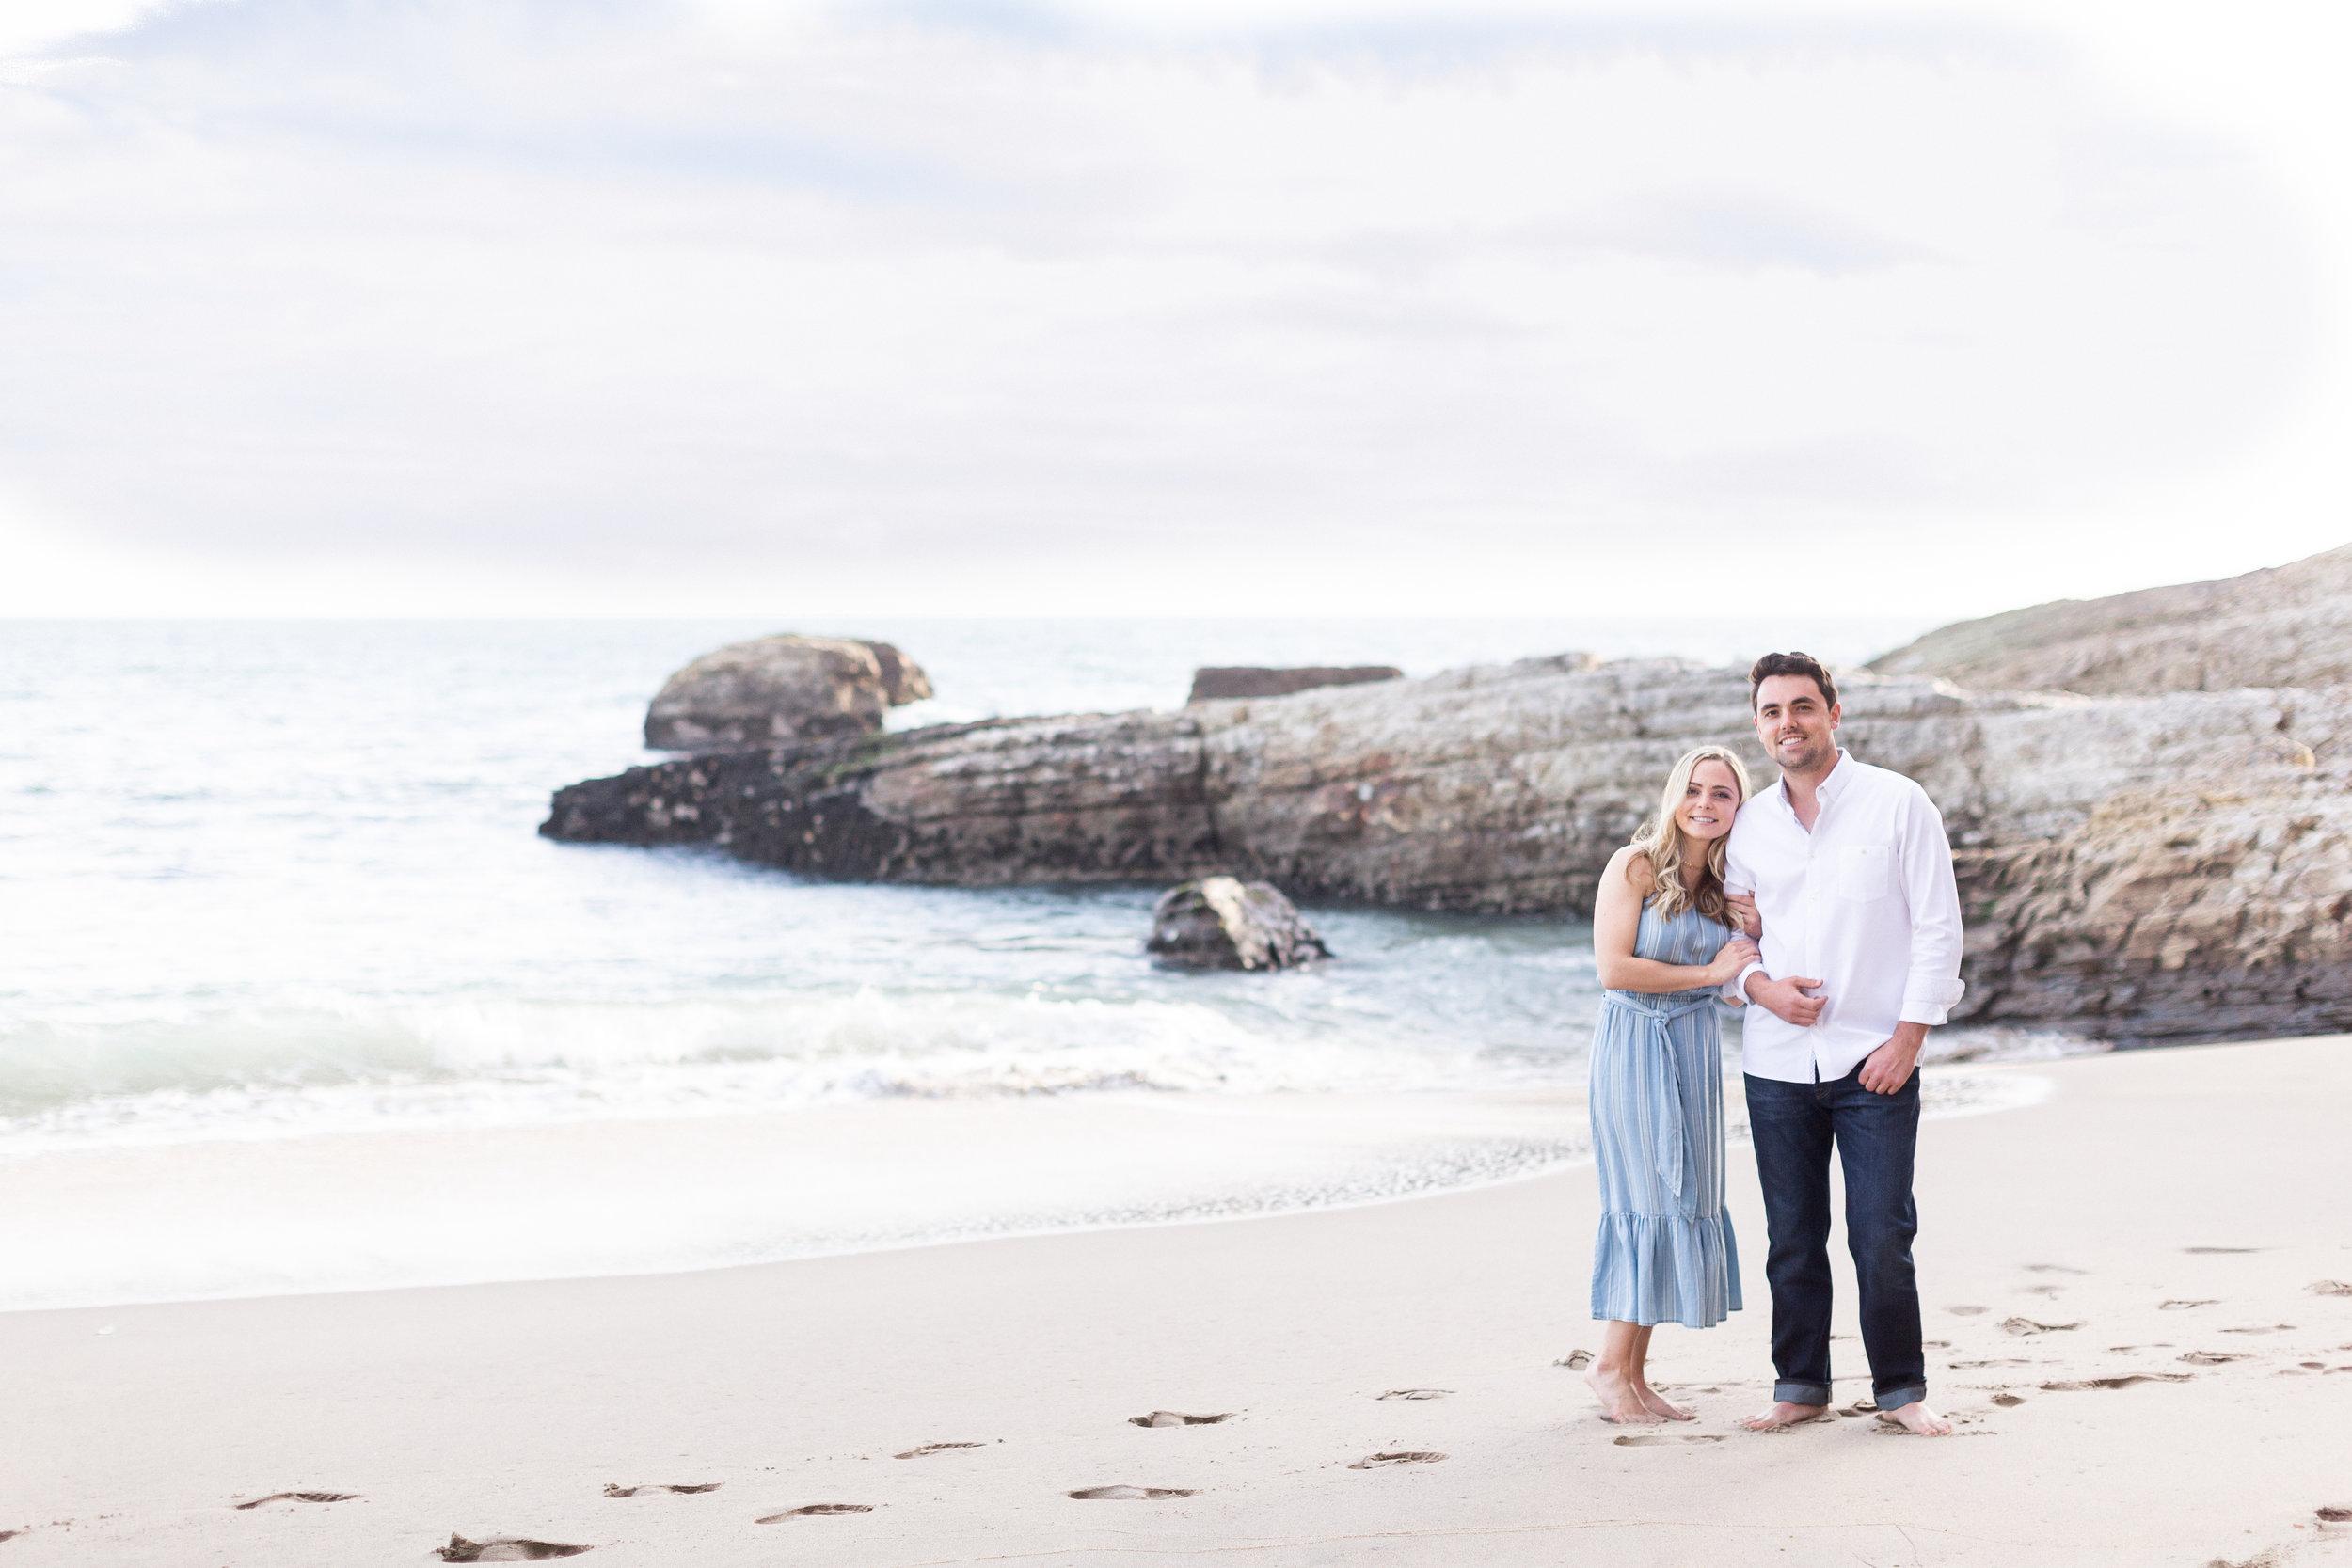 panther-beach-santa-cruz-engagement-session-photographer-37.jpg